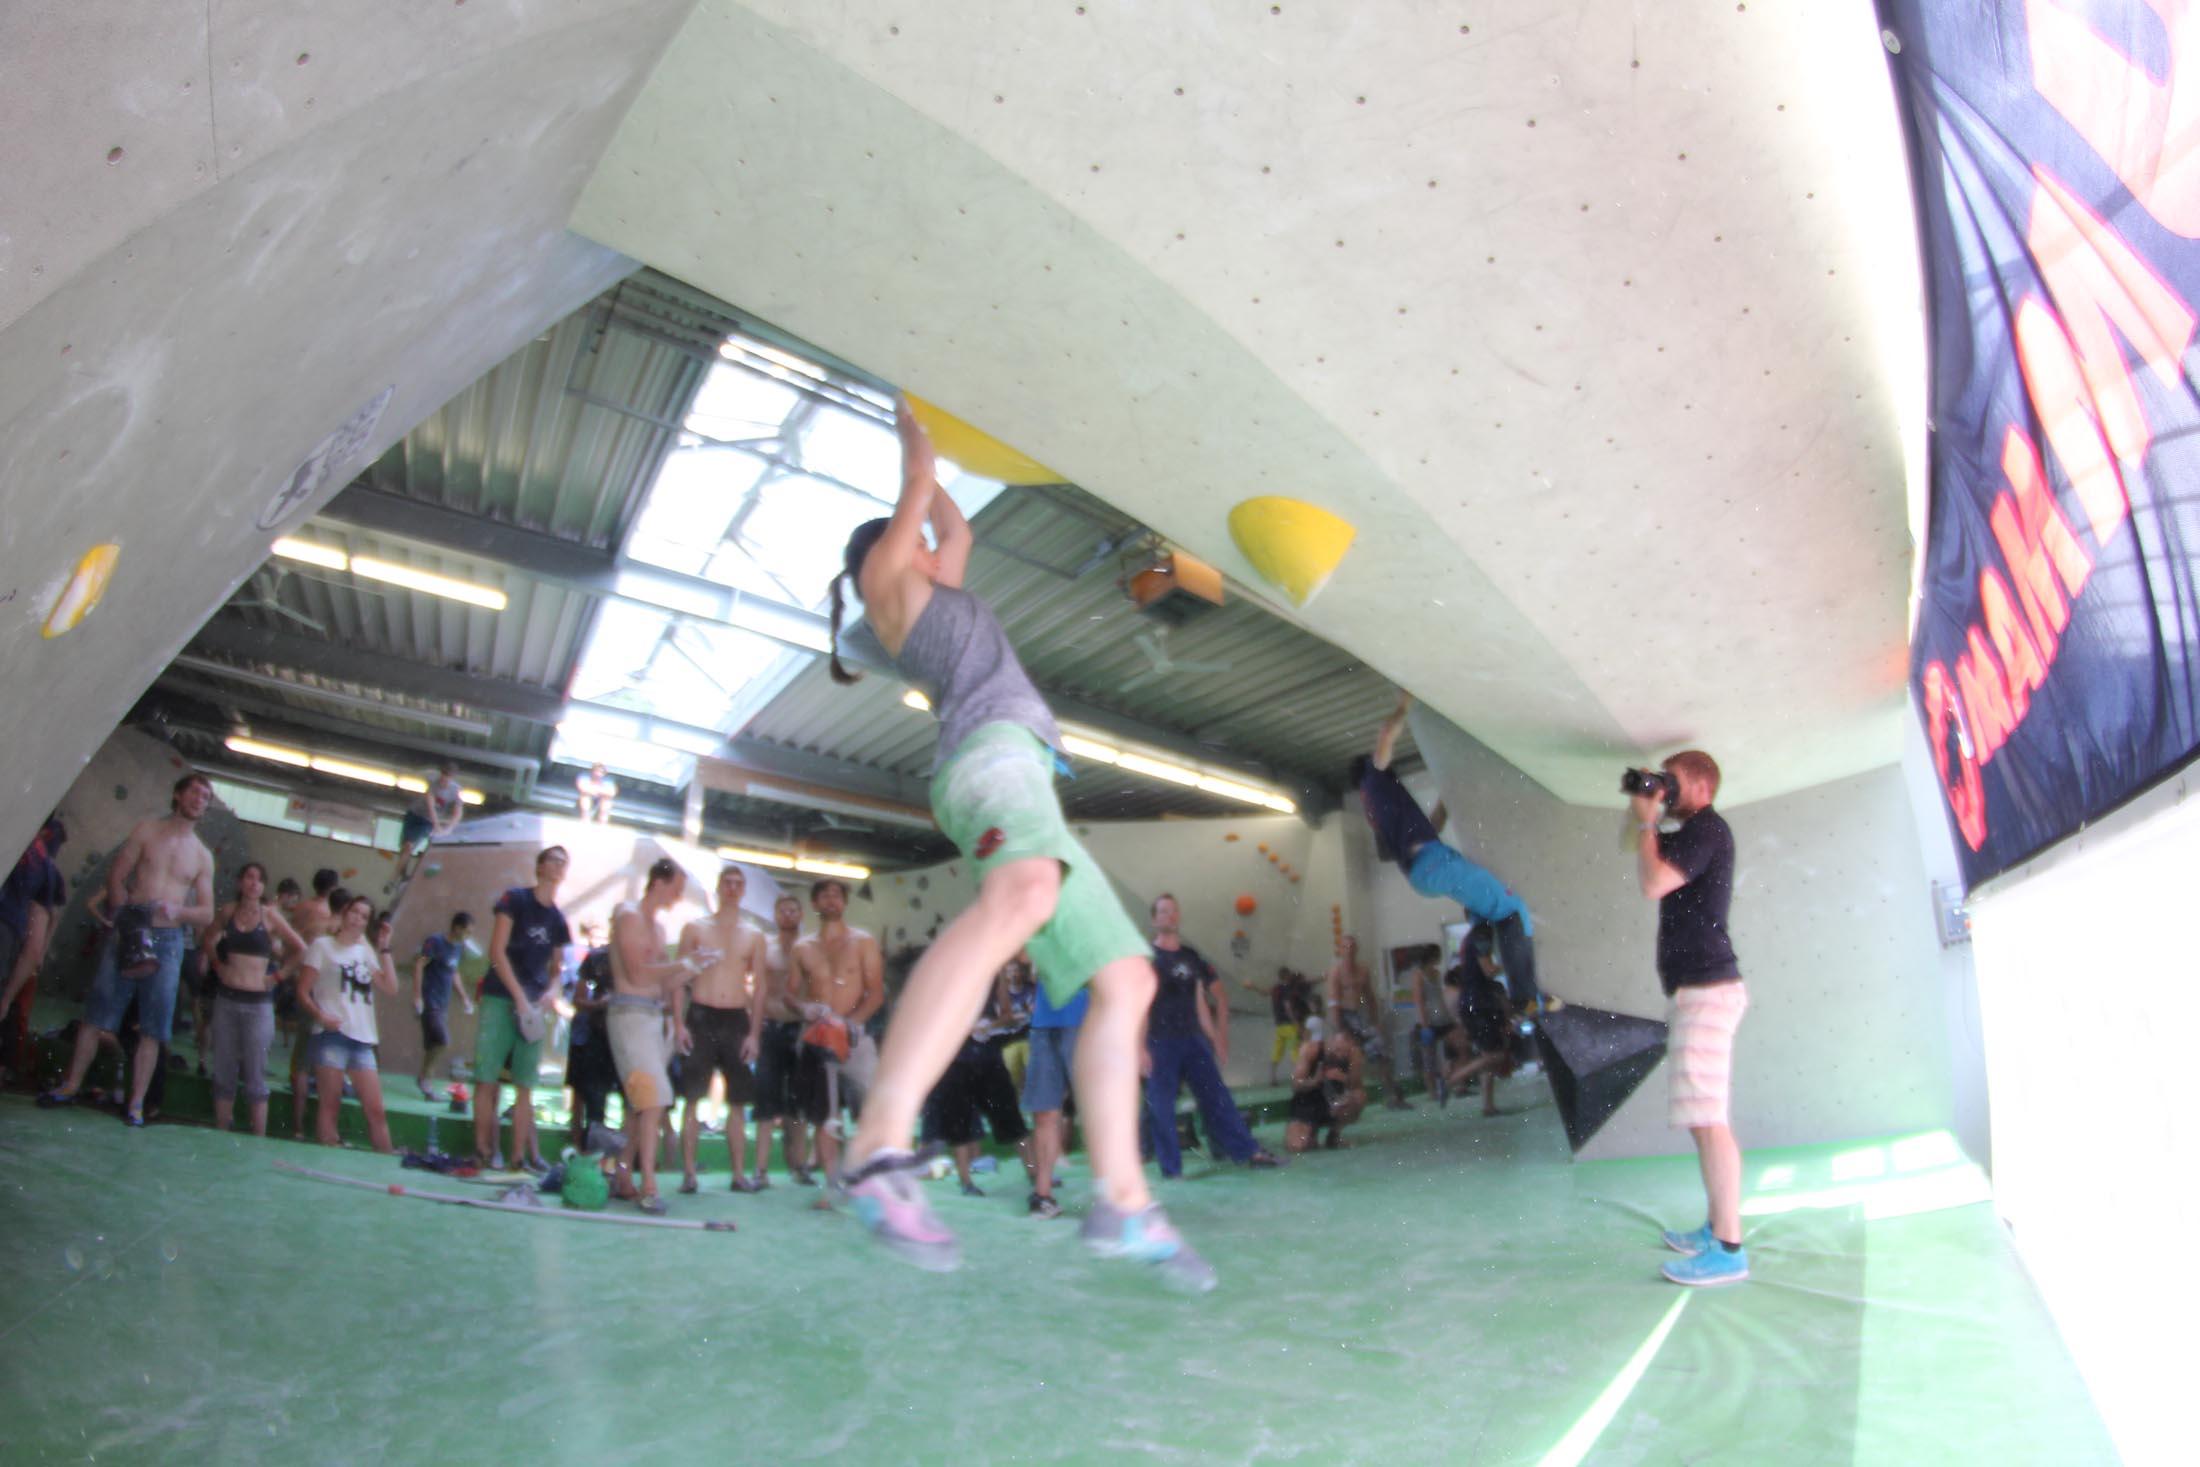 Quali, internationaler bouldercup Frankenjura 2016, BLOCKHELDEN Erlangen, Mammut, Bergfreunde.de, Boulderwettkampf07092016170